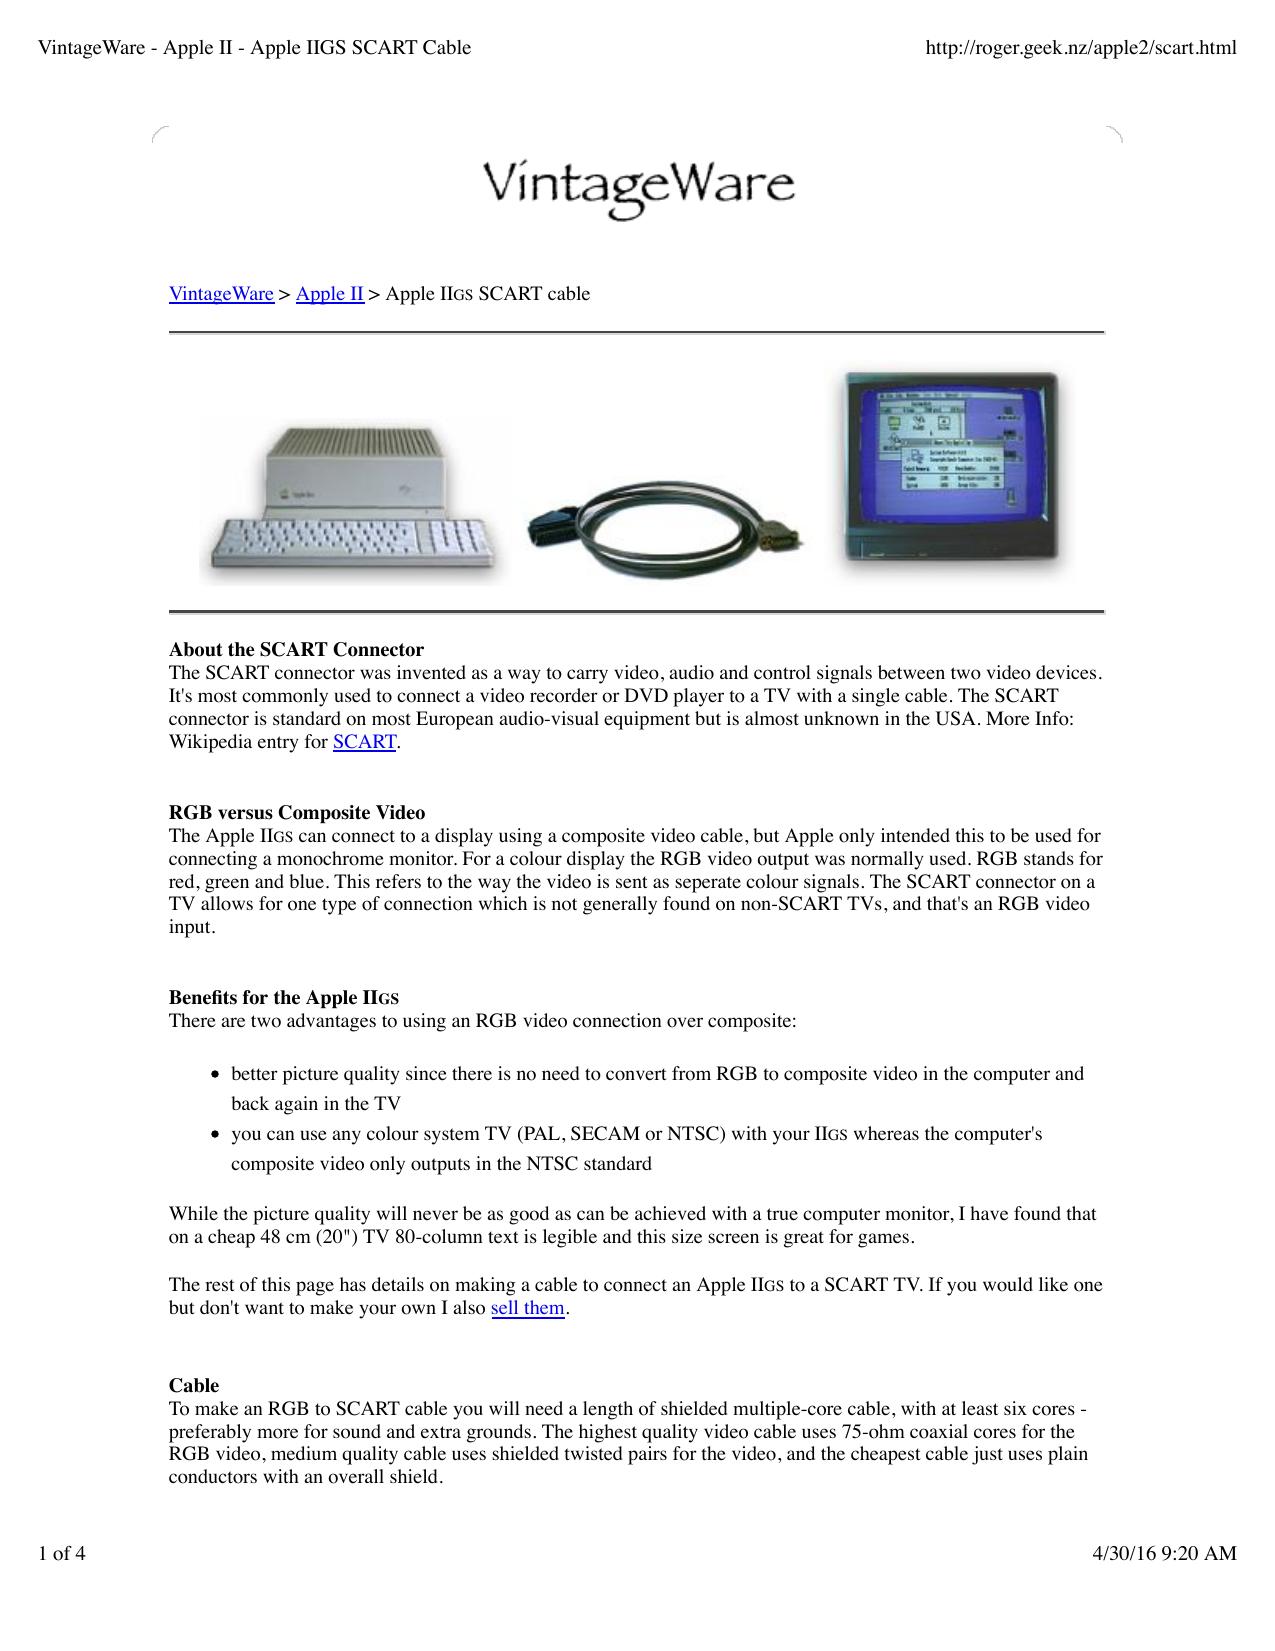 VintageWare - Apple II - Apple IIGS SCART Cable   manualzz.com on